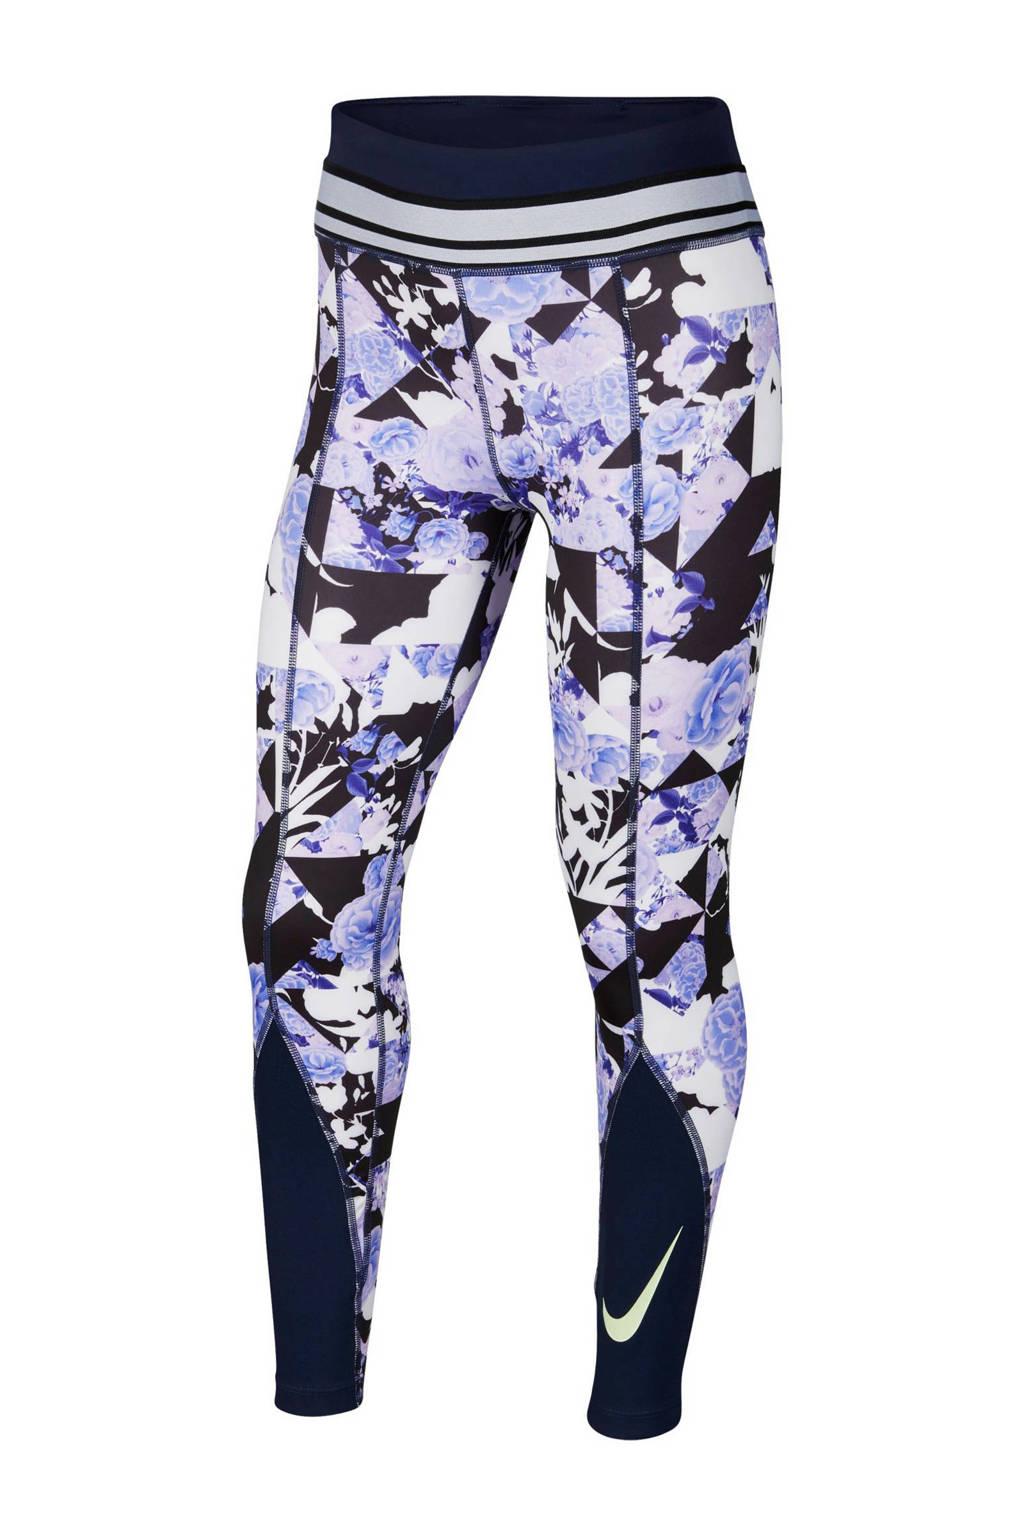 Nike legging lila/donkerblauw, Lila/donkerblauw